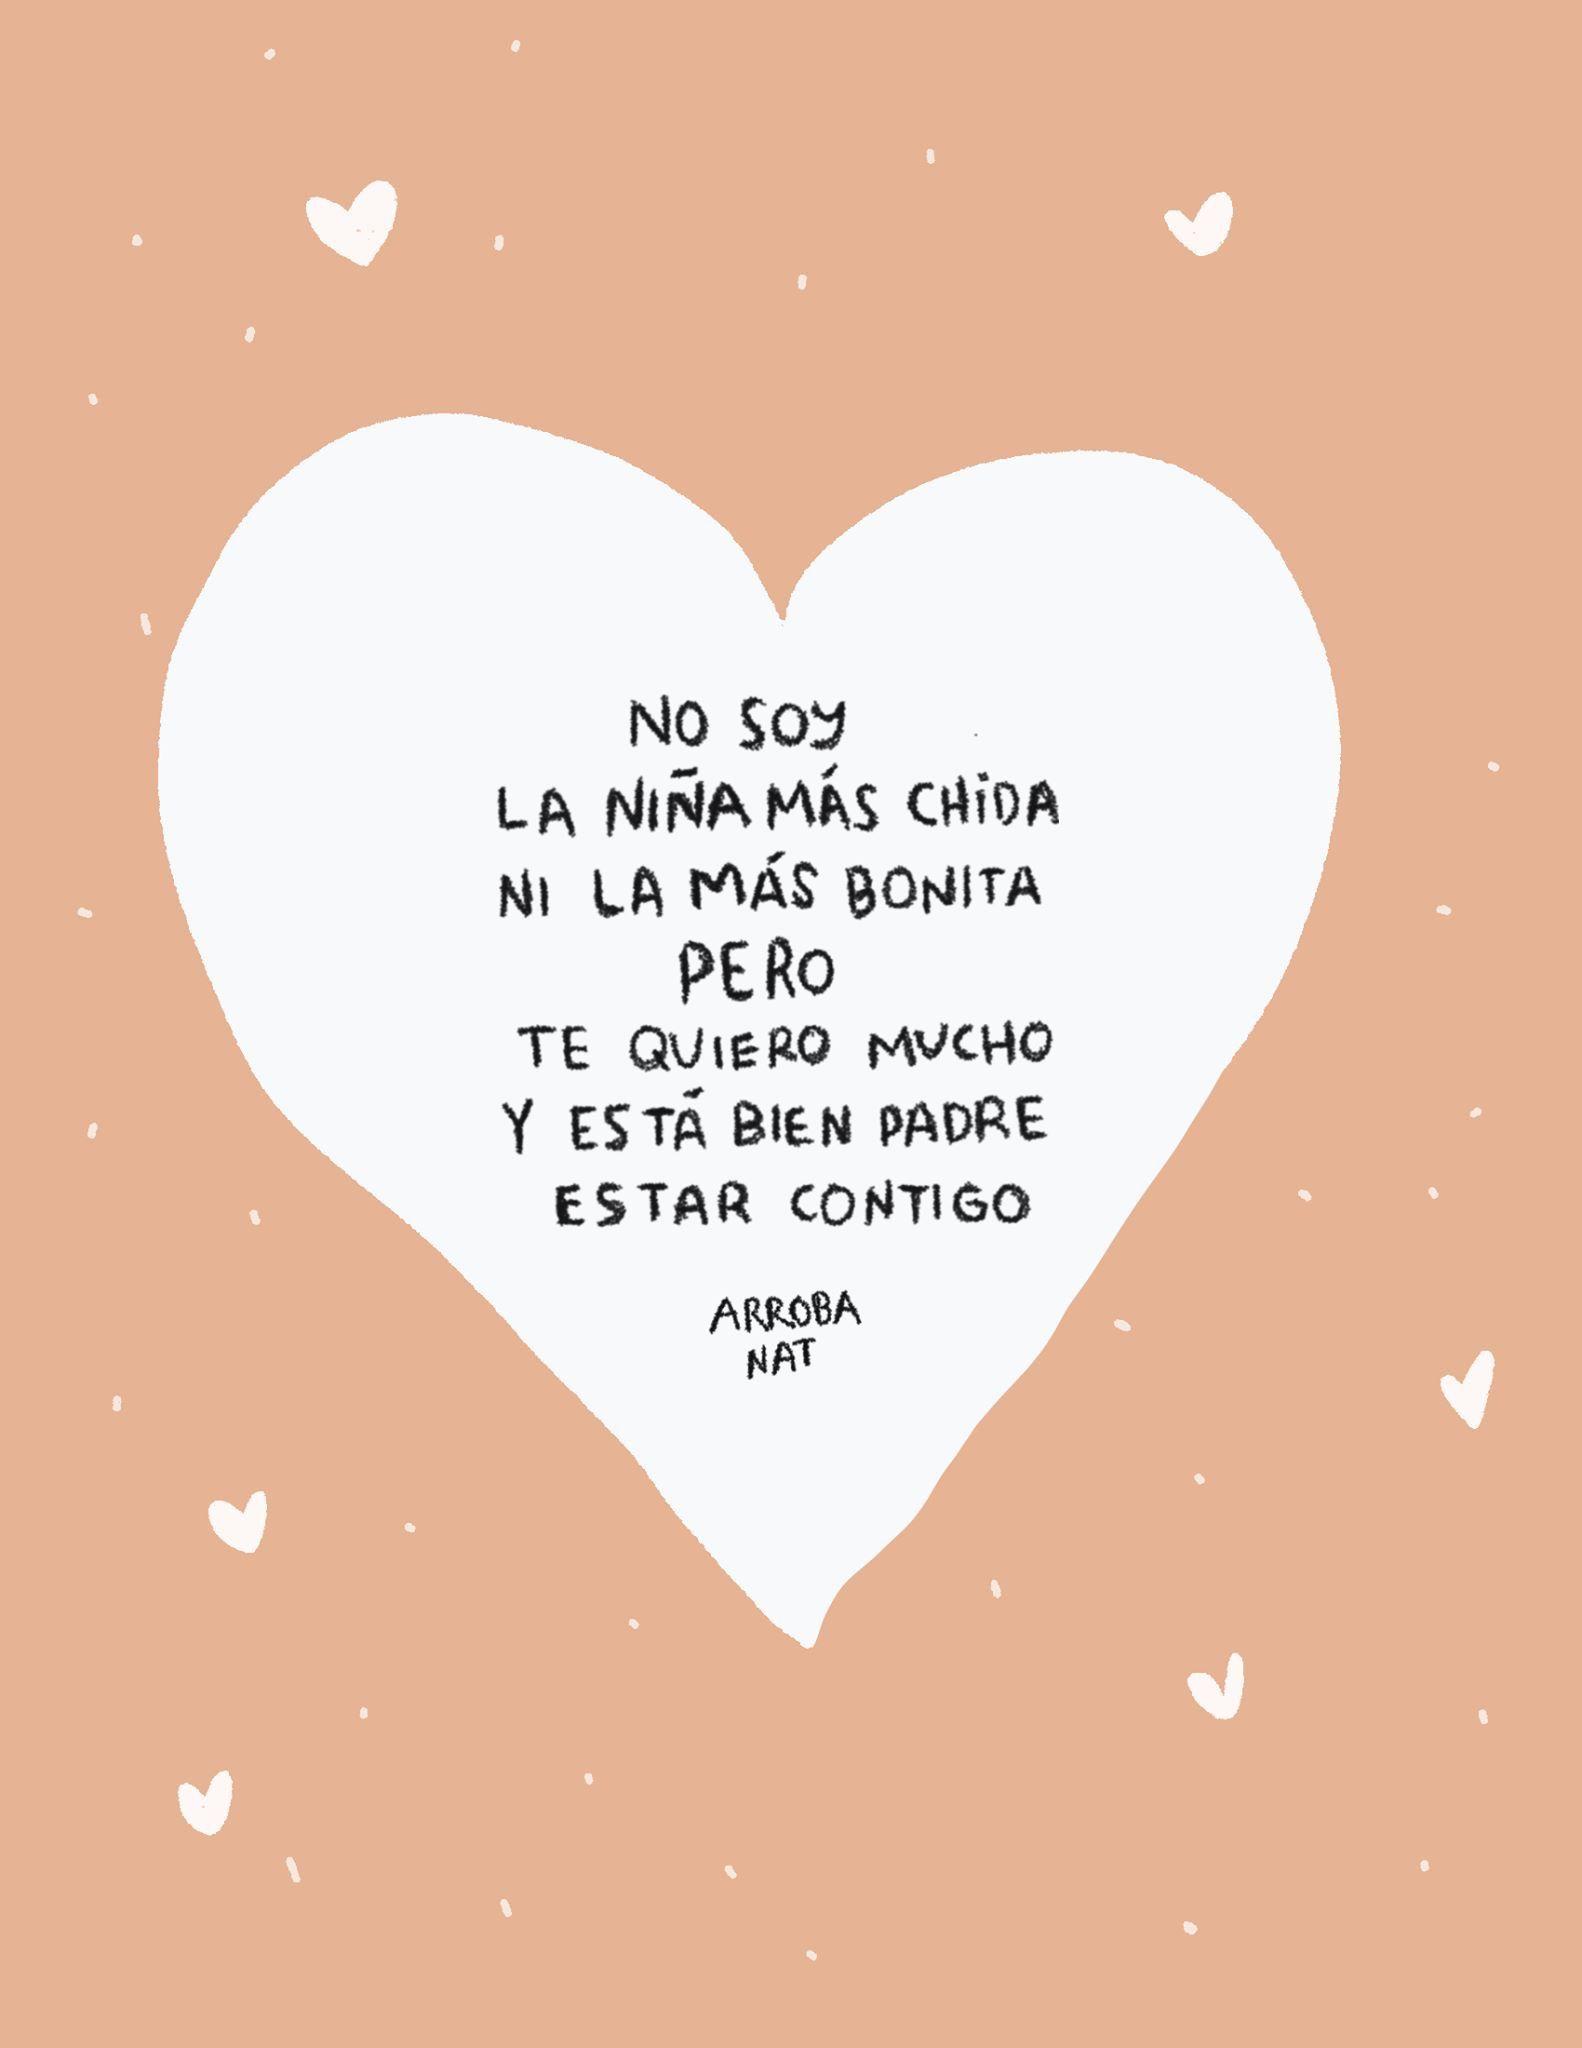 Tequiero Nosoy Frases Arrobanat Frases Bonitas Frases Love Frases Cursis